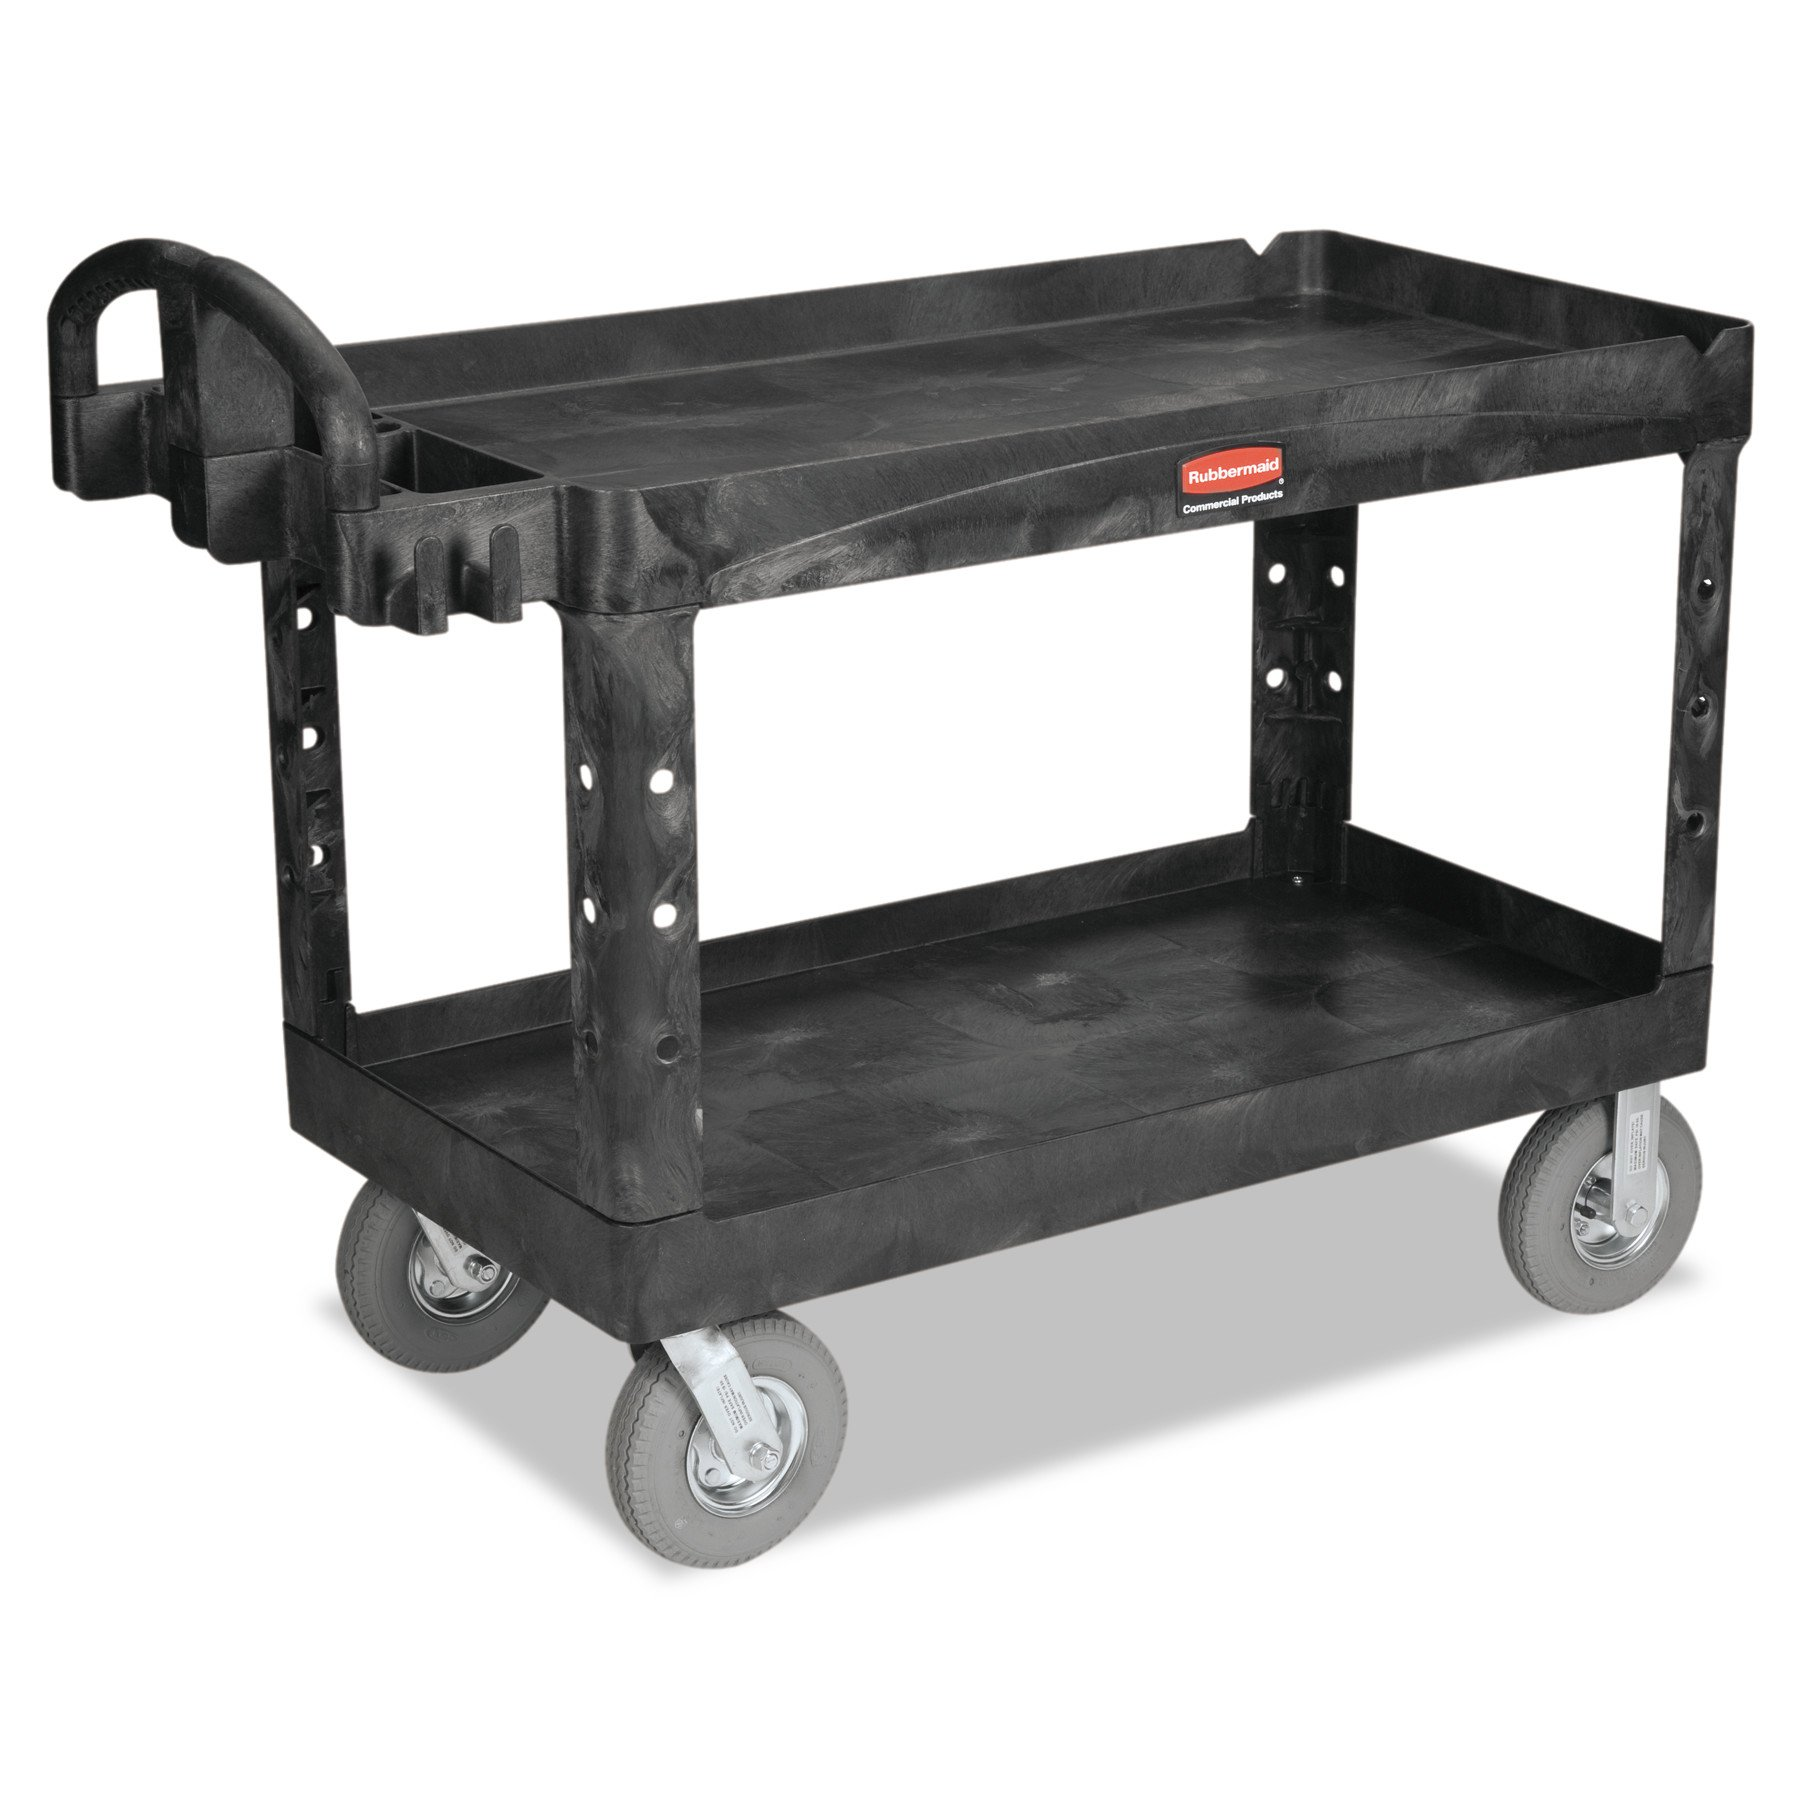 Rubbermaid 4546 BLA 750 lbs Mass Capacity, Black Color, Heavy-Duty 2 Shelf Utility Cart with Large Lipped Shelf